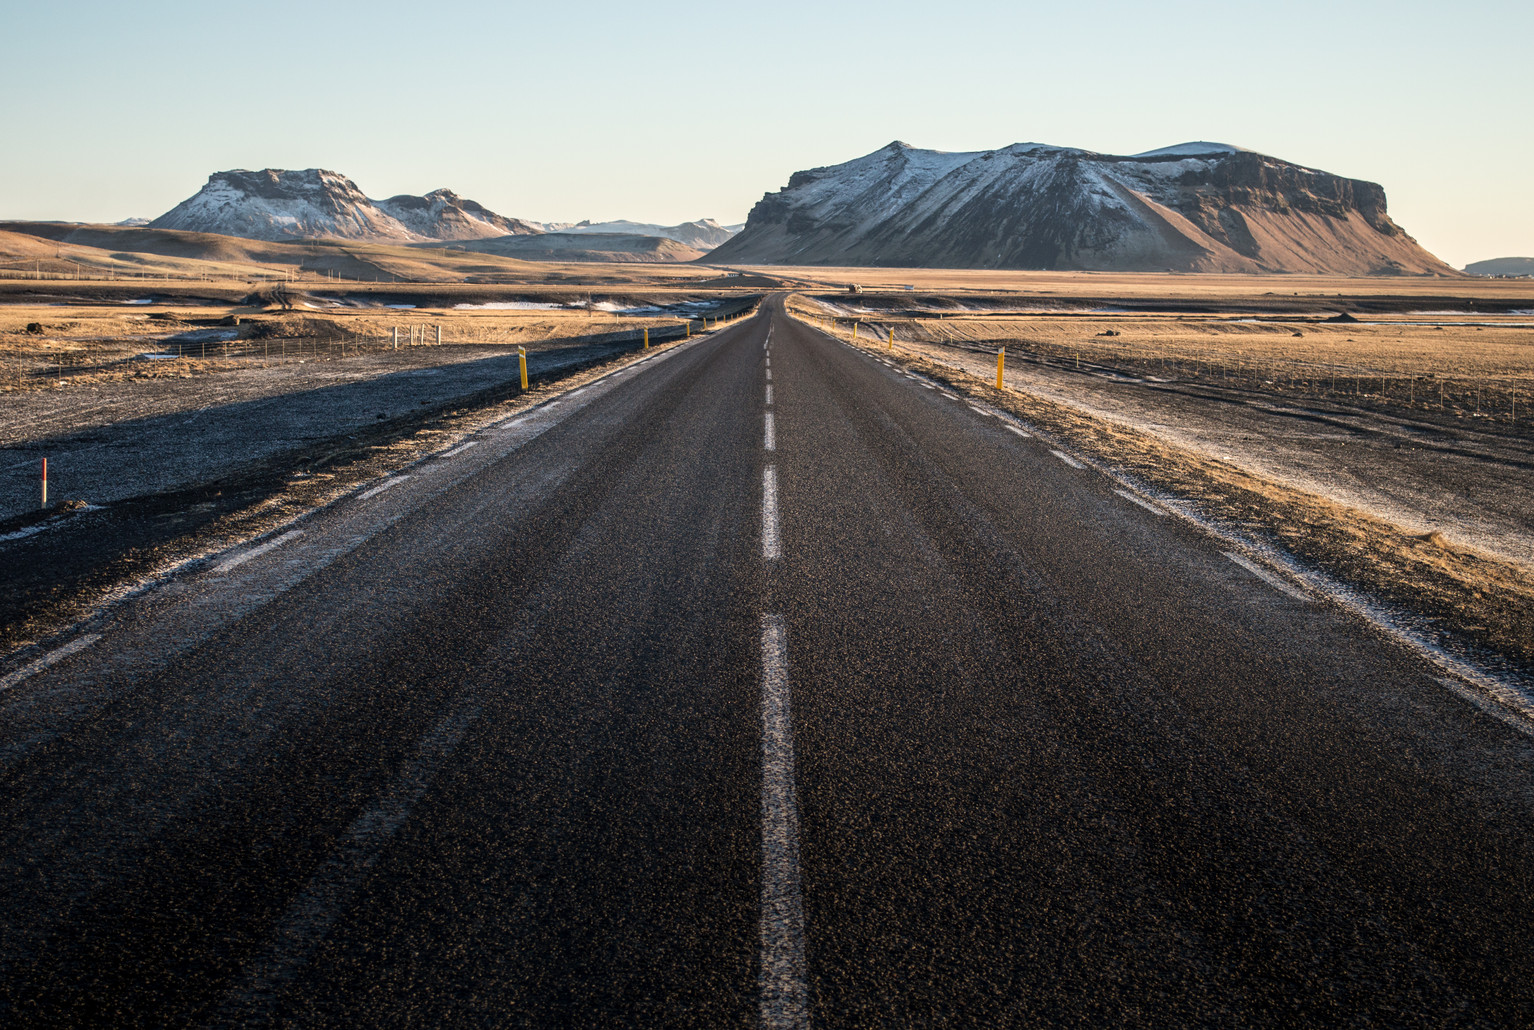 Frozen roads in Iceland's golden circle.